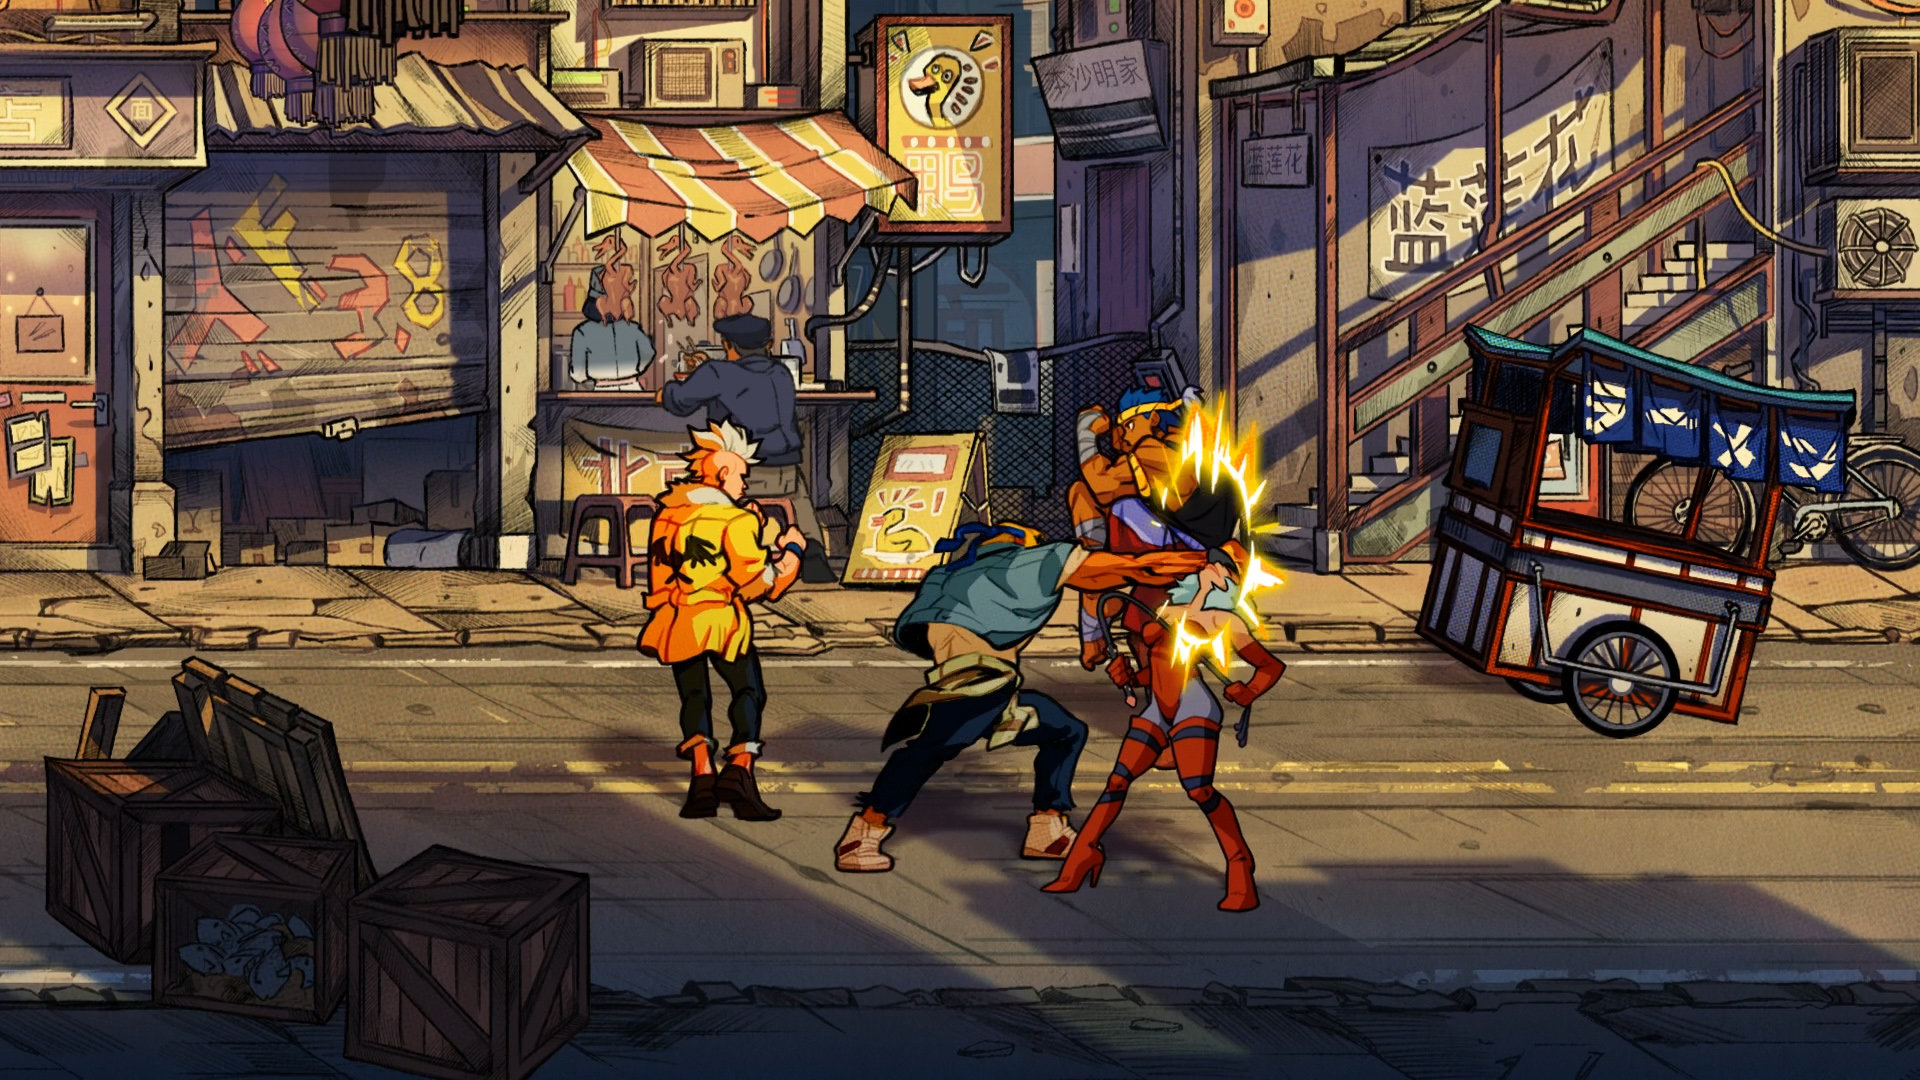 Streets of Rage 4 MacBook Version gameplay